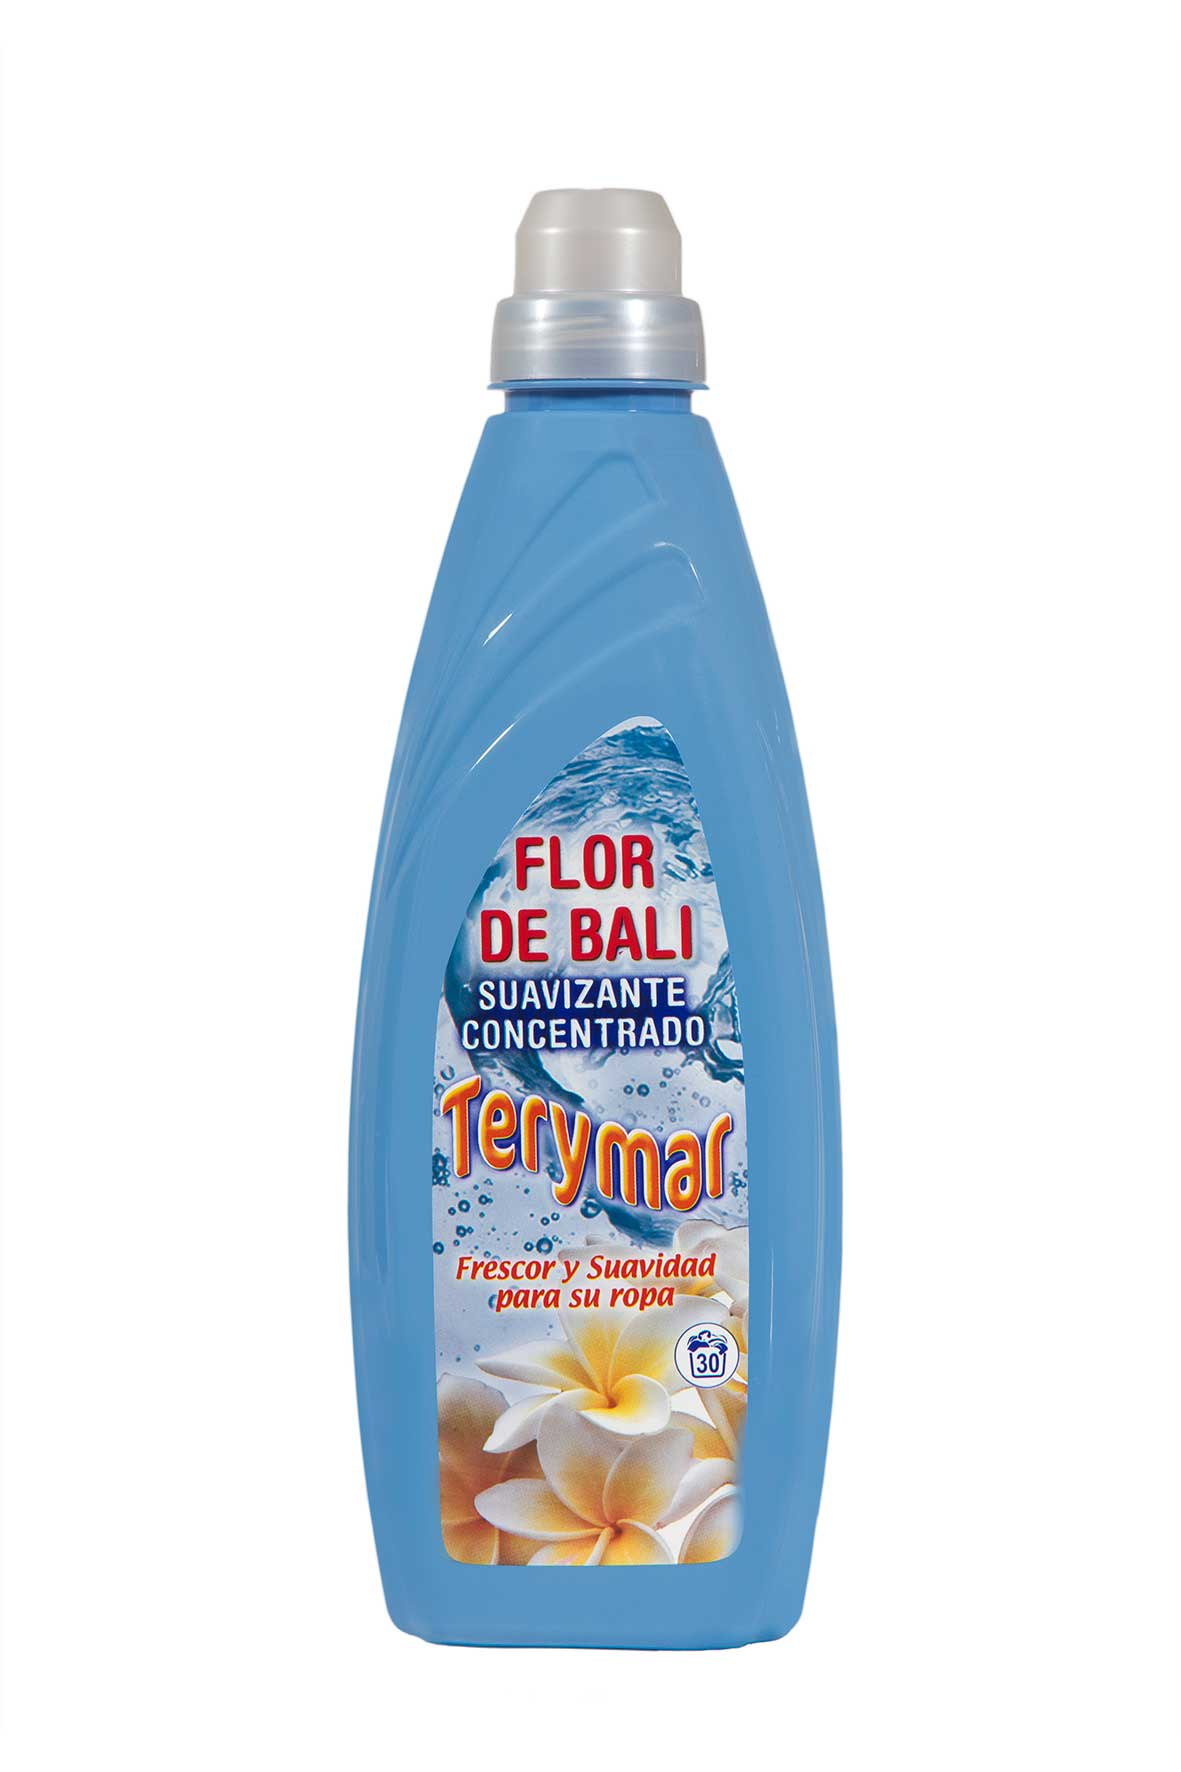 Suavizante Flor de Bali 900 ml